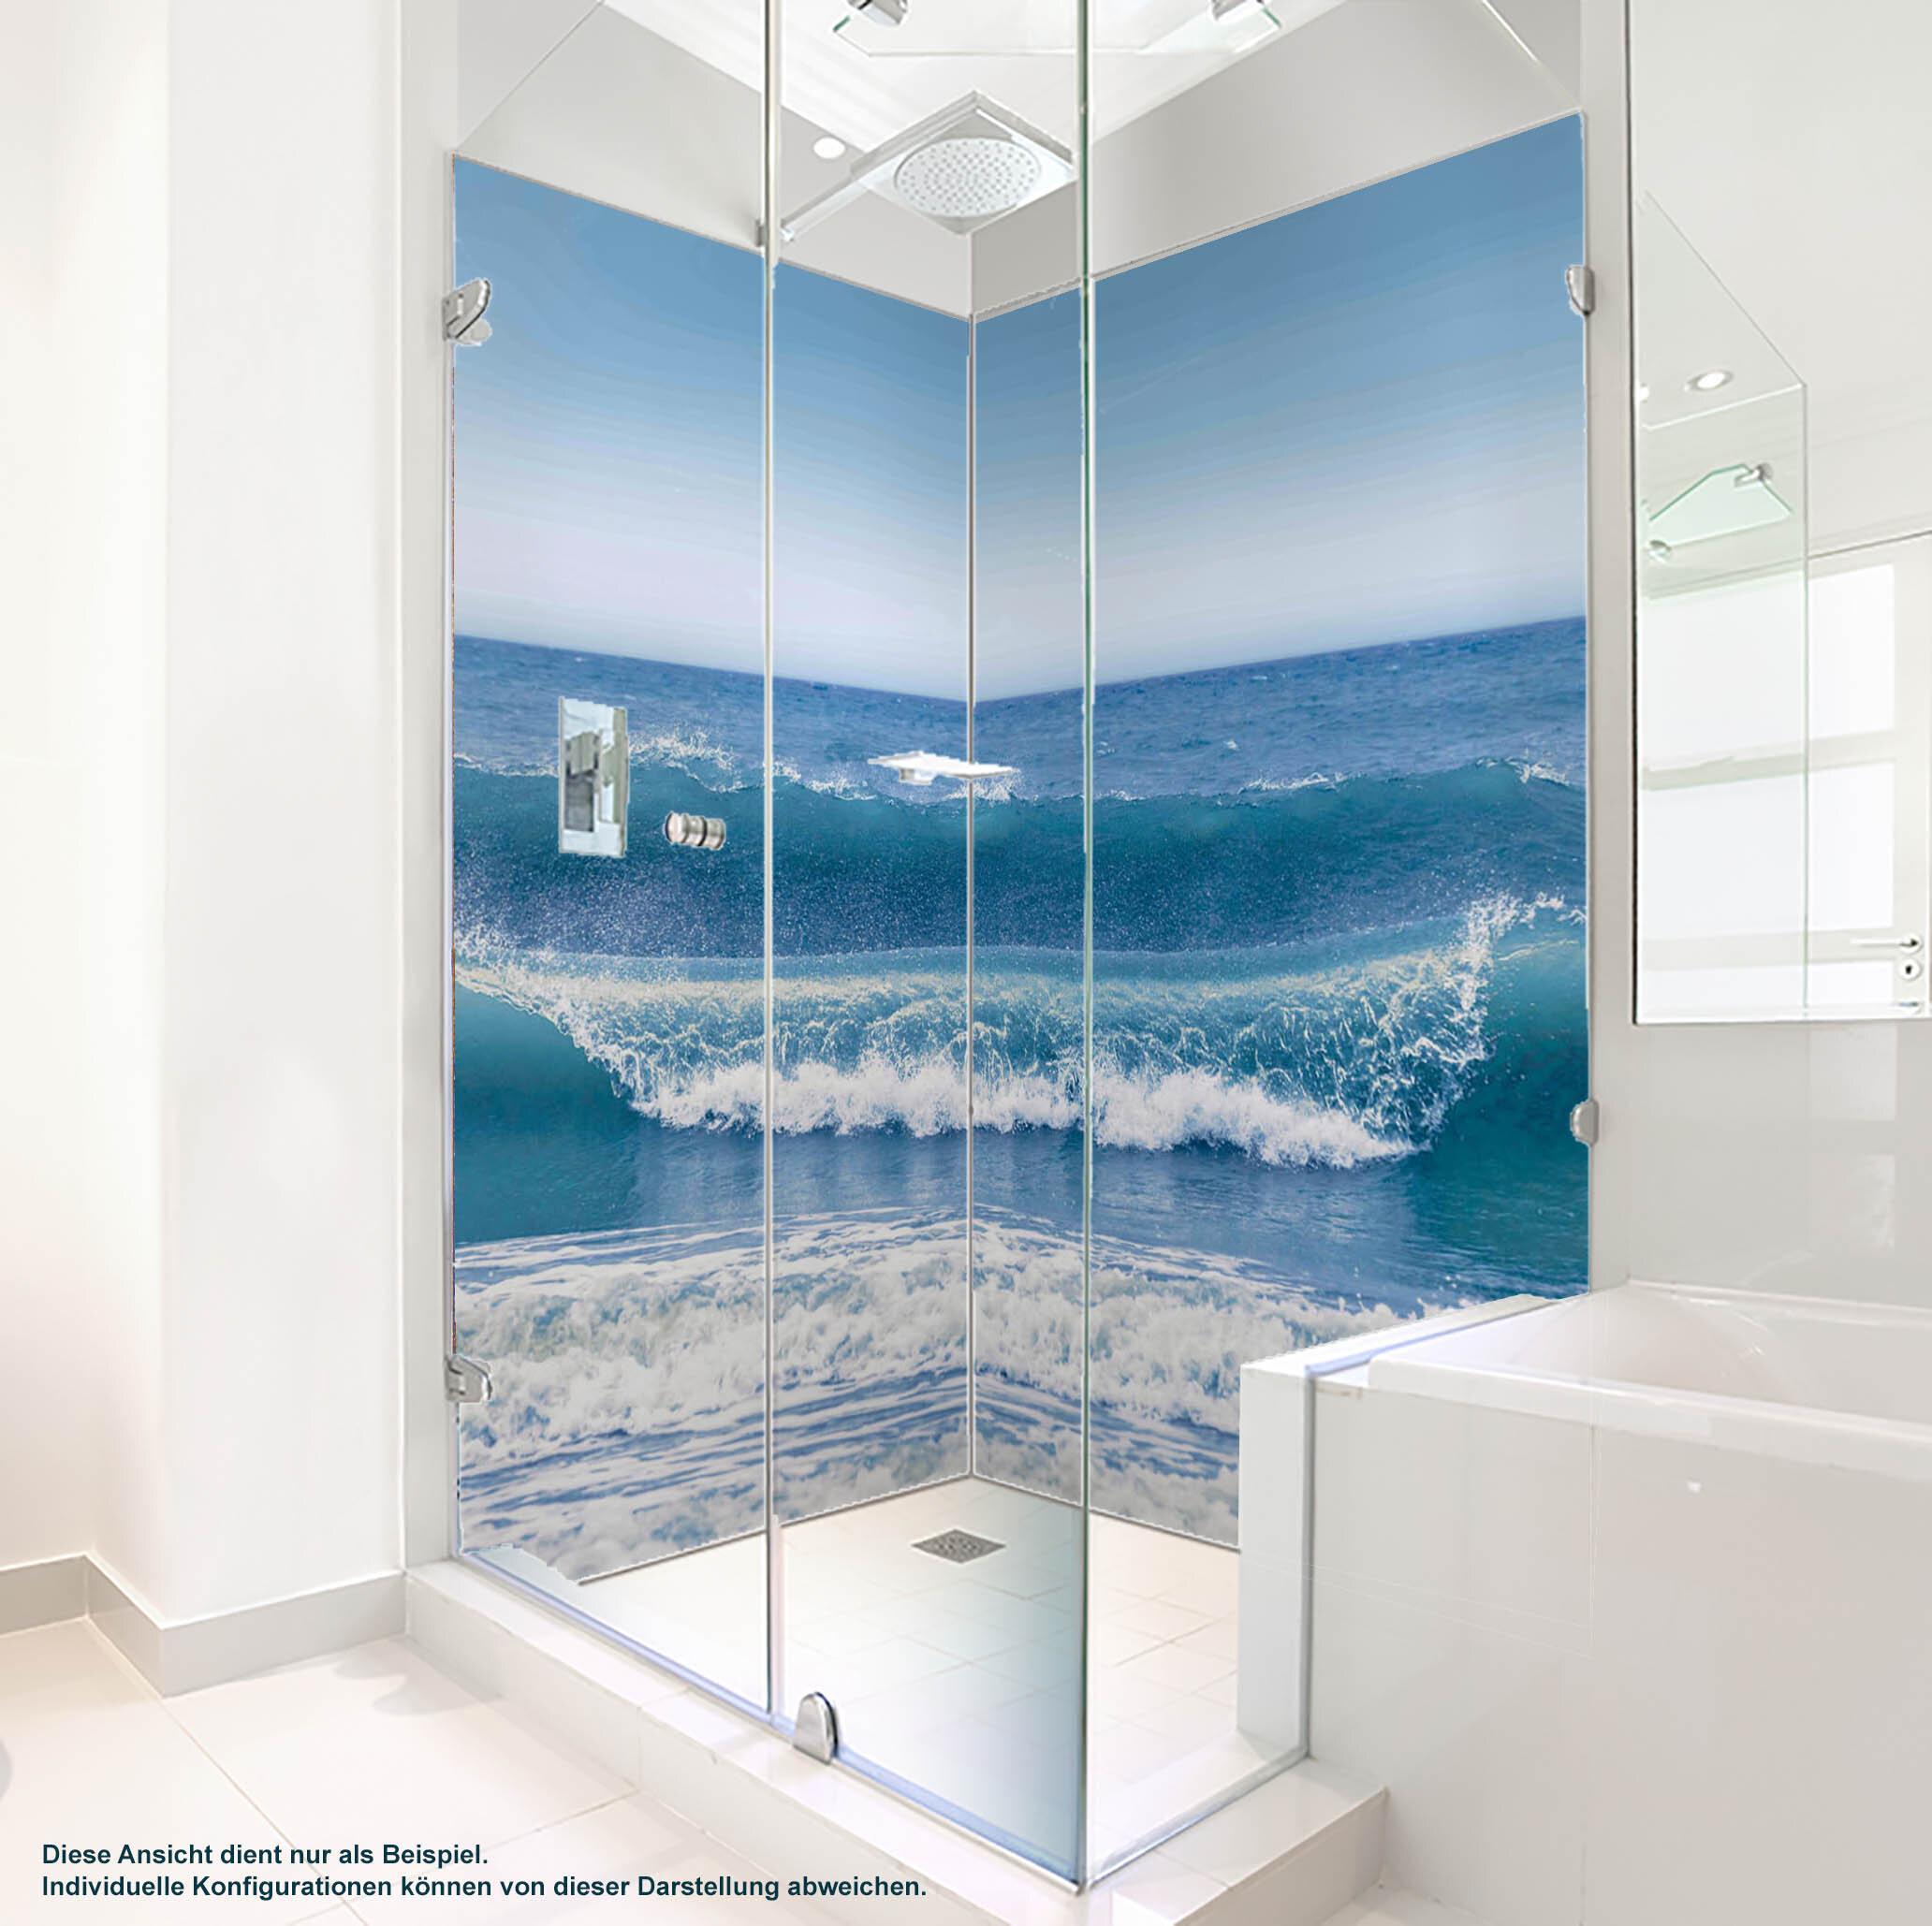 Dusche PlateART Duschrückwand mit Motiv Strand und Meer Wellen